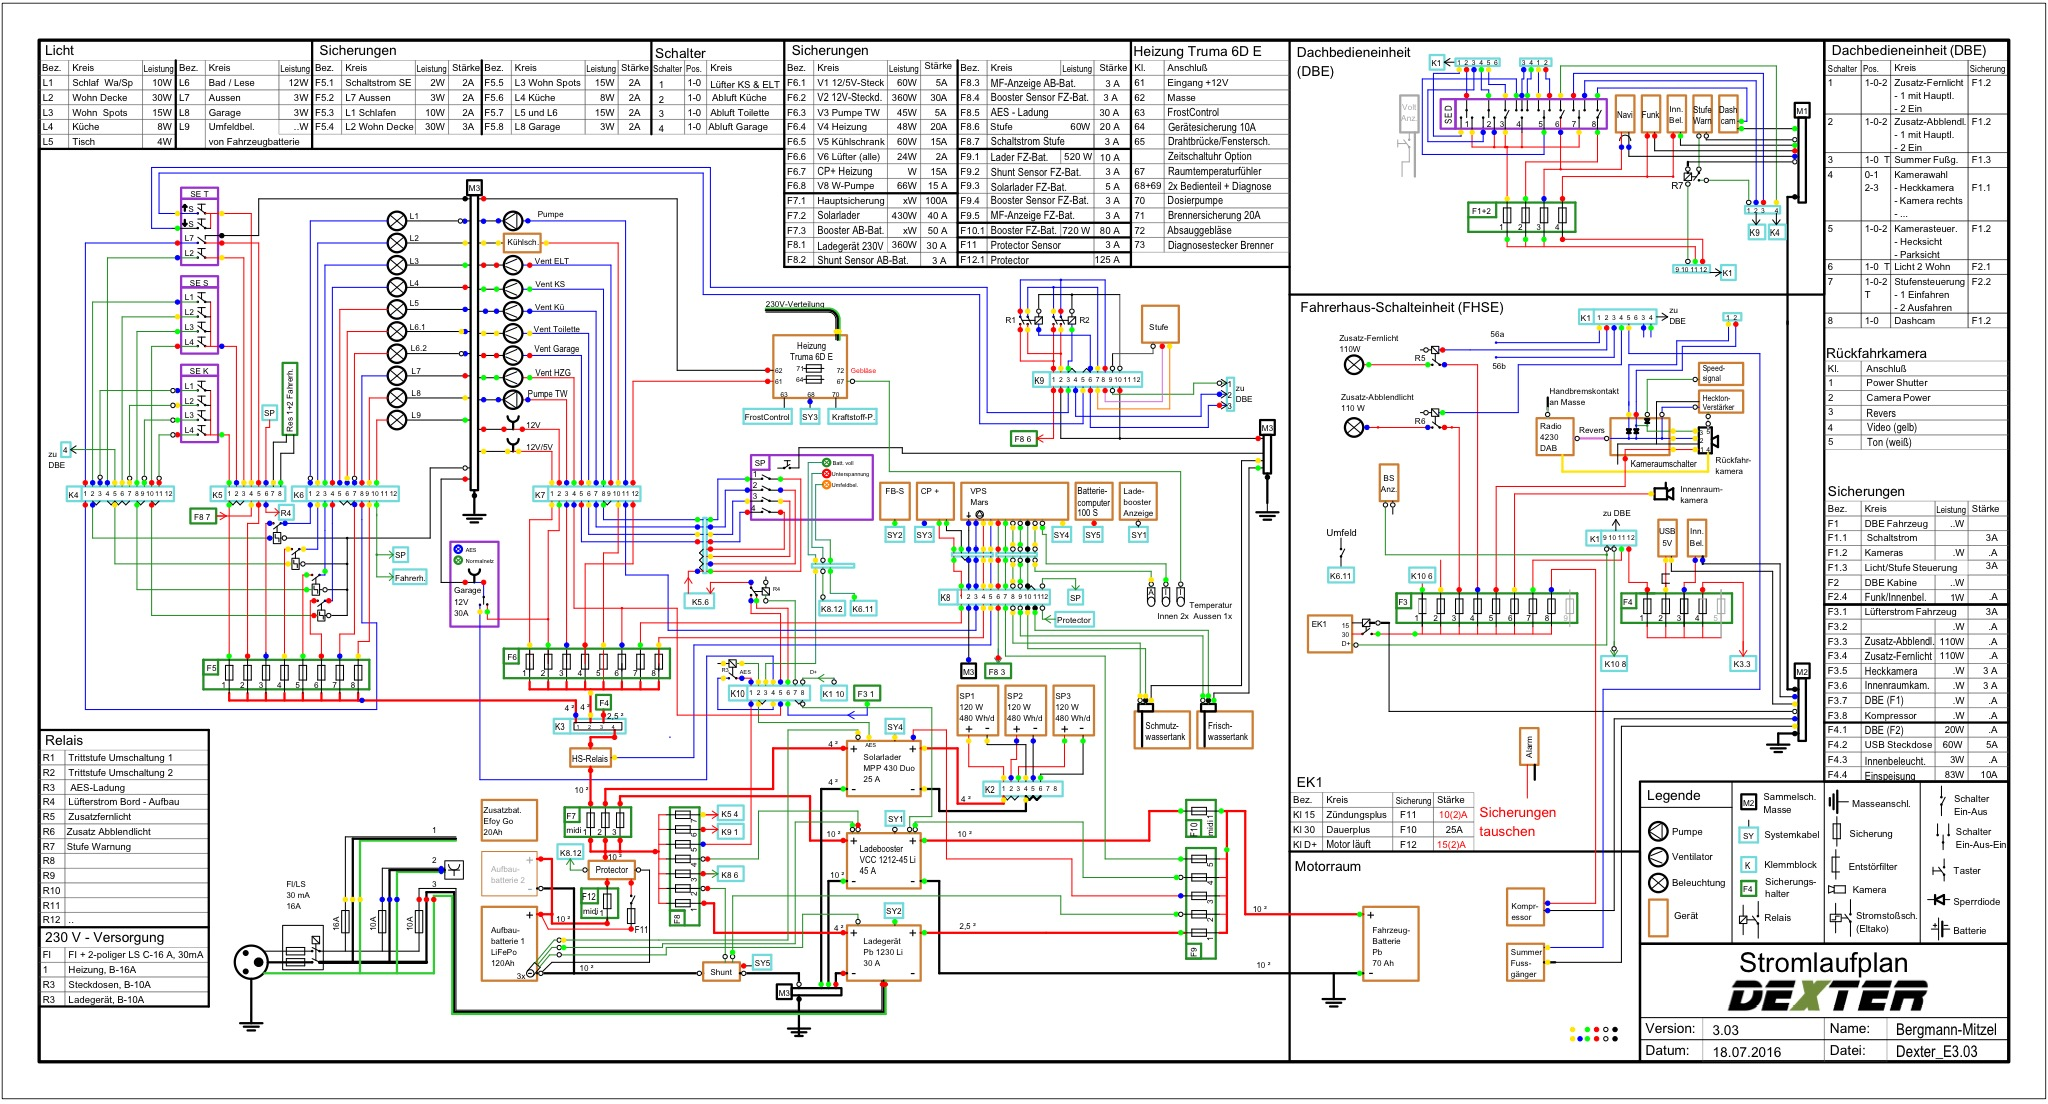 dexter axle wiring diagram wiring diagrams onedexter axle wiring schematic wiring diagrams dexter axle electric brake wiring diagram dexter axle wiring diagram